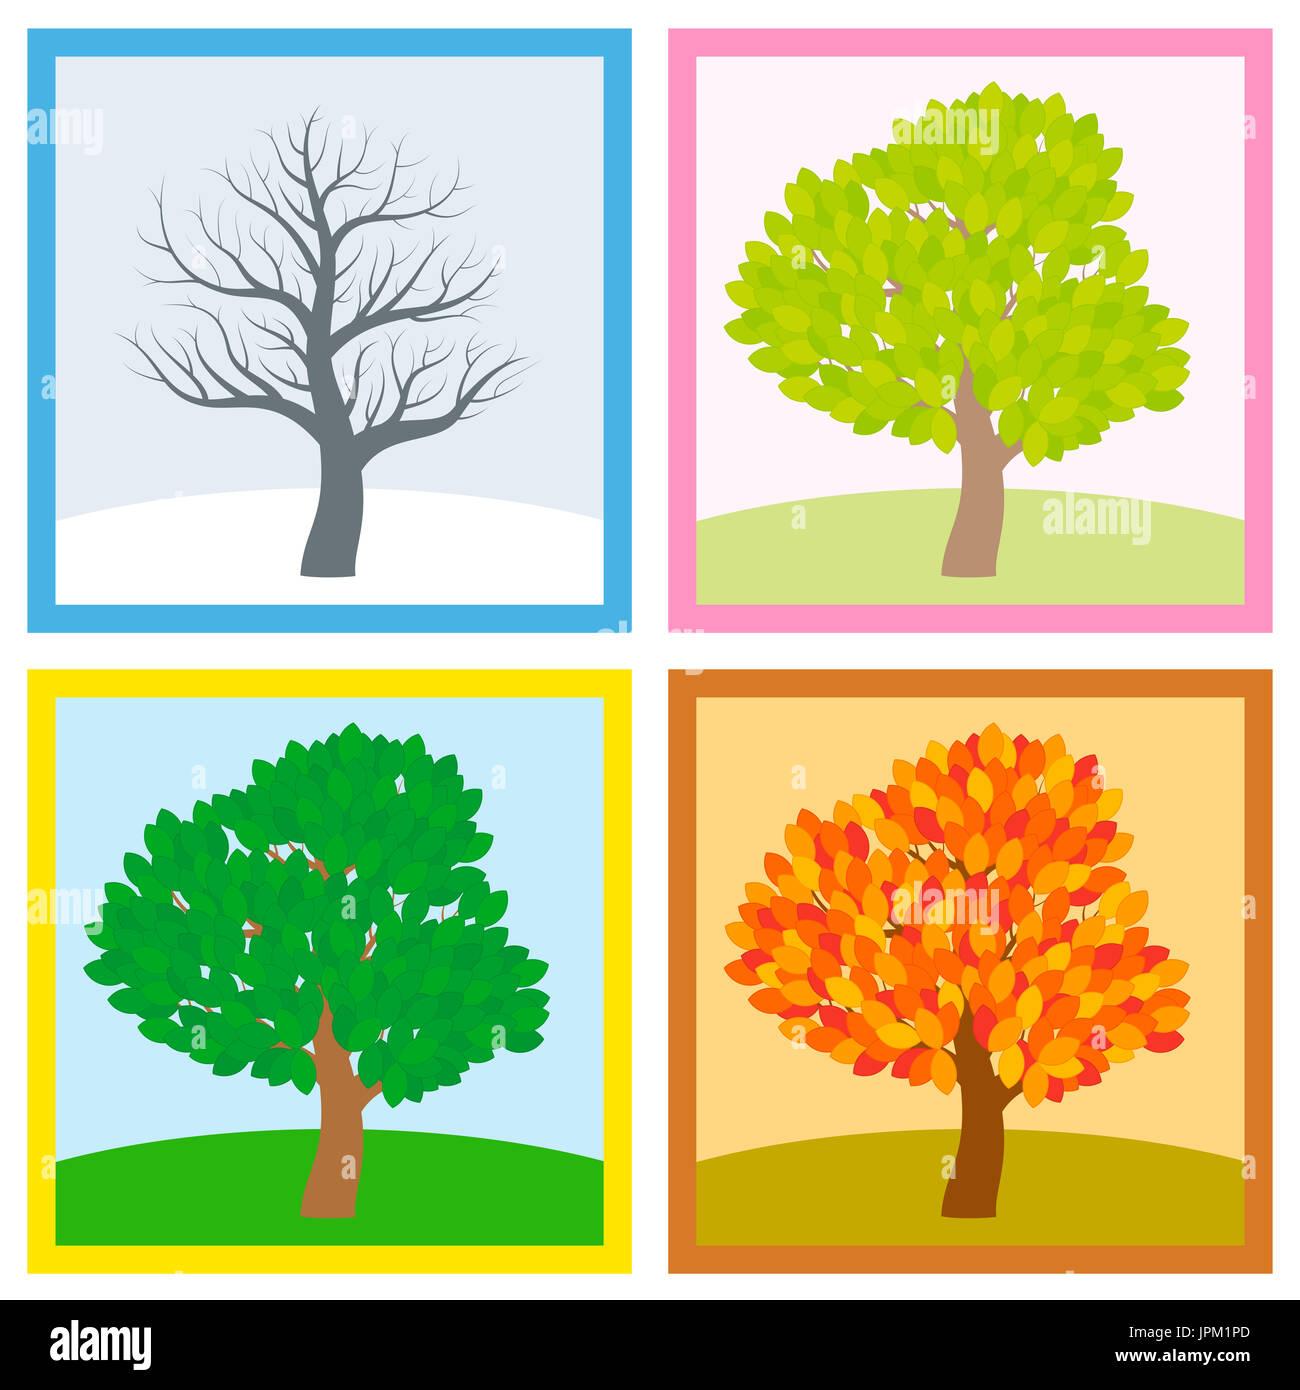 tree in four seasons spring stockfotos & tree in four